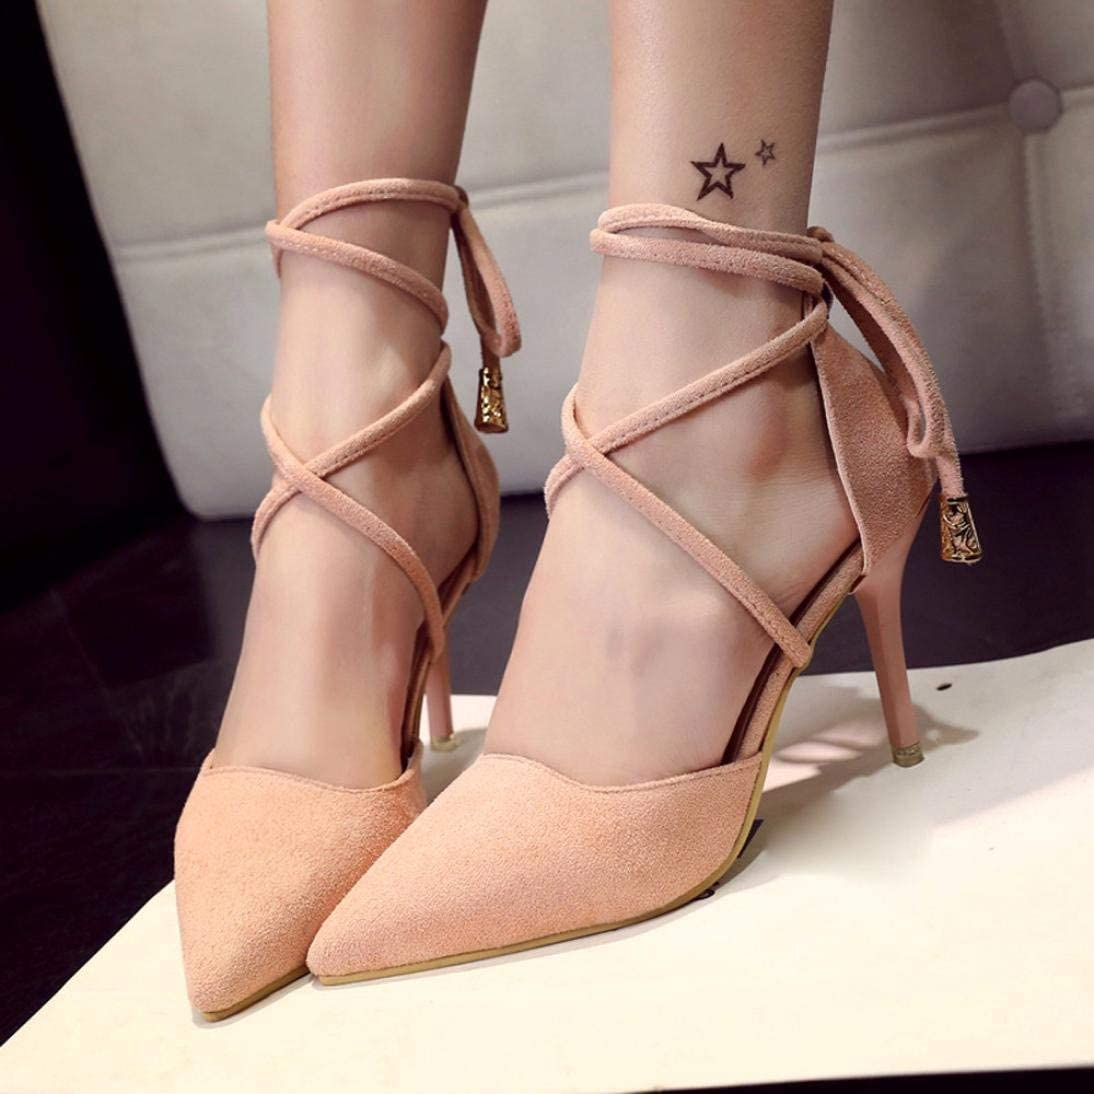 JackieTD Womens Stiletto Heel Point Toe Dress Pumps Ankle Tie Sandals